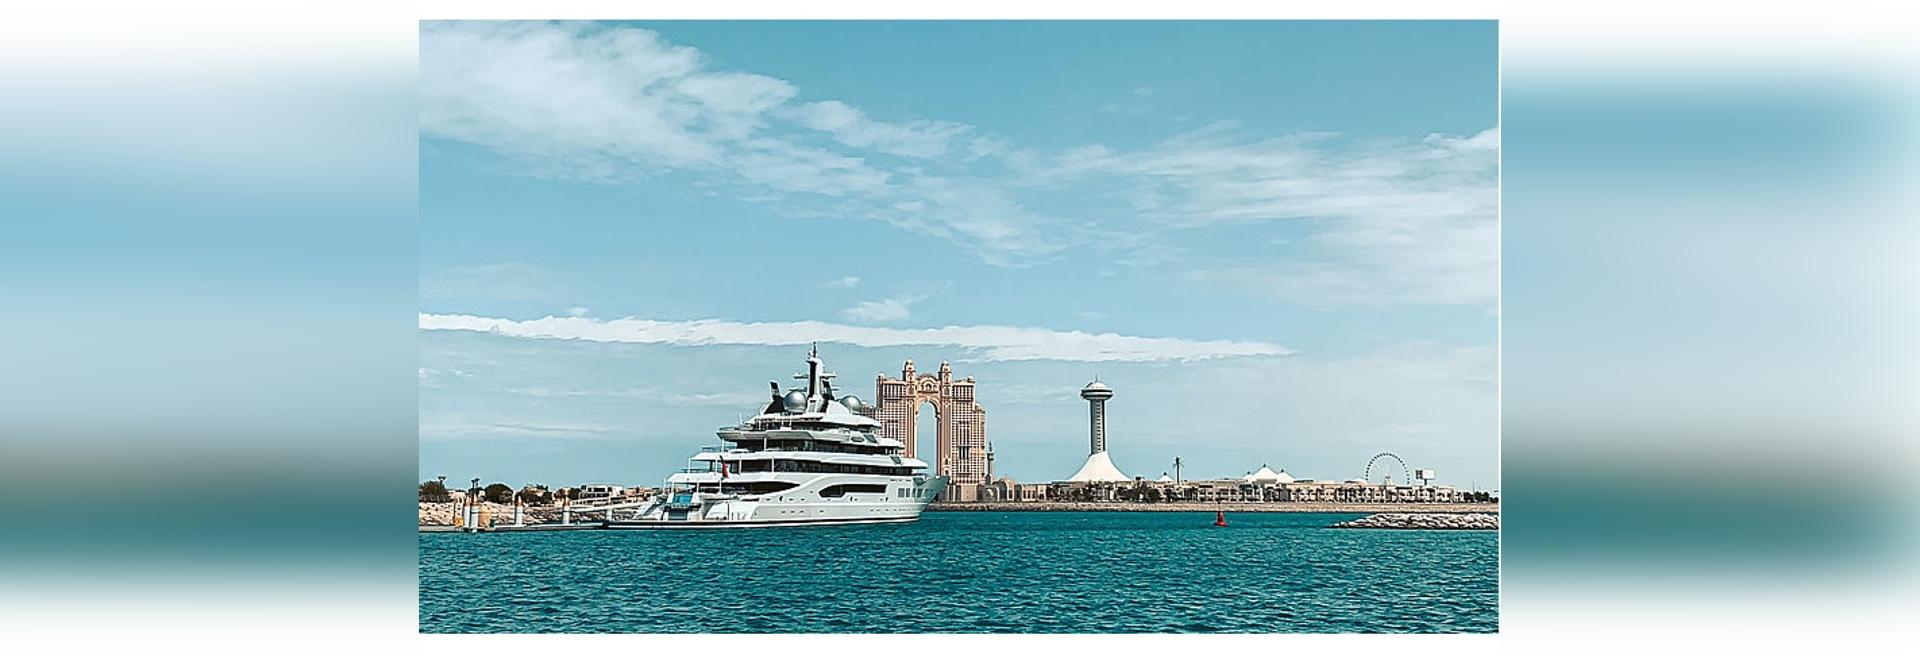 A day on board the 106m superyacht Amadea in Abu Dhabi